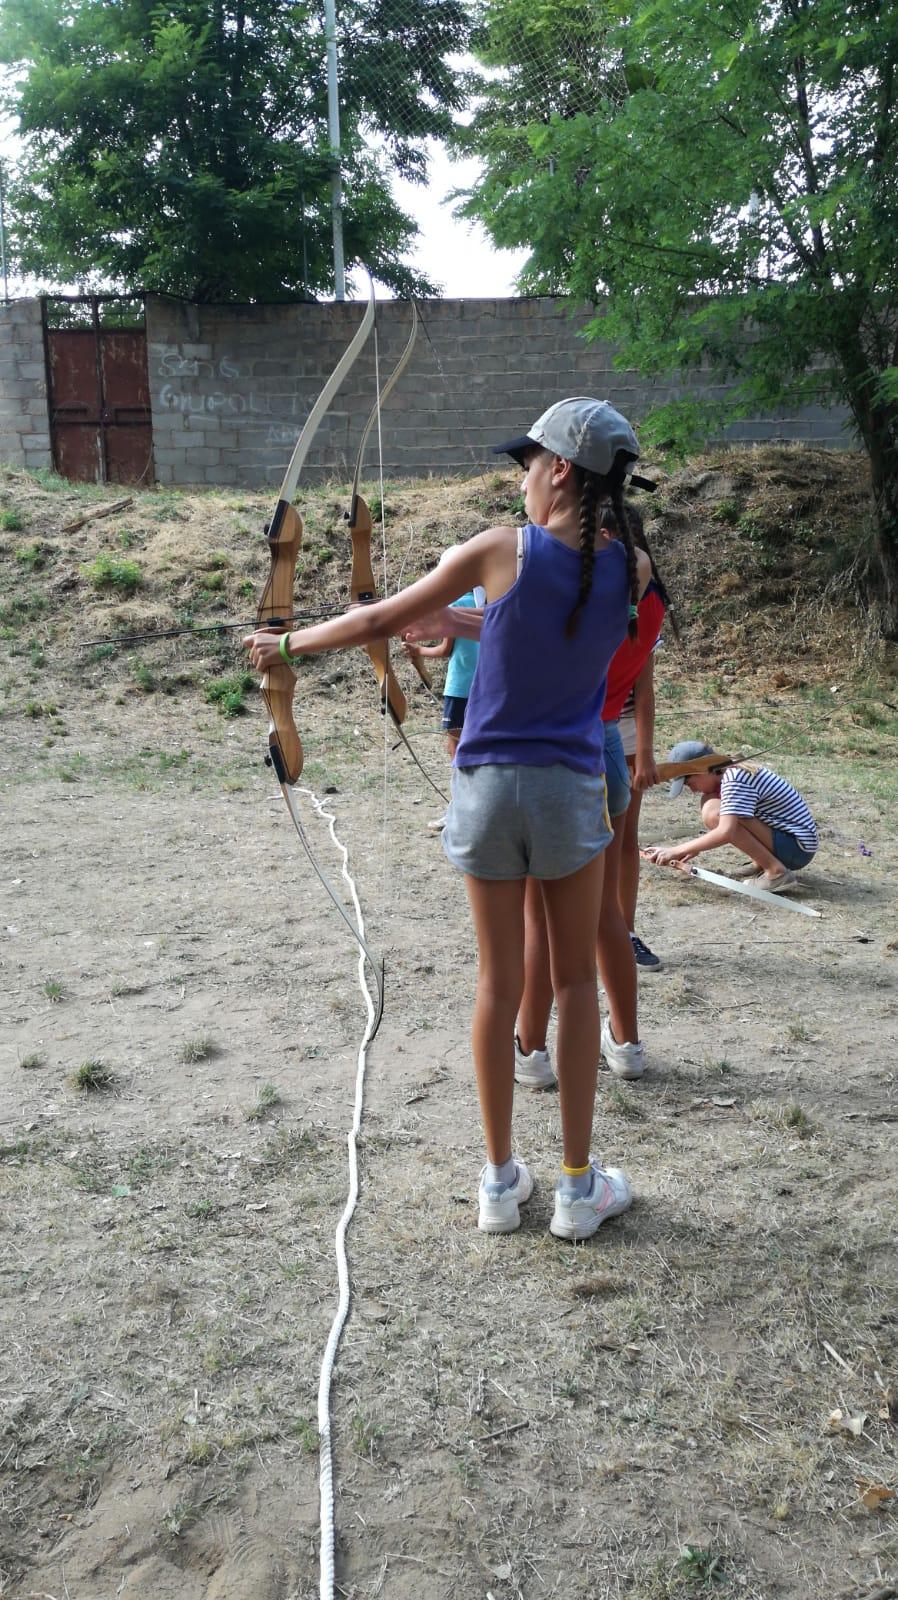 Tiro con arco. Campamento de verano julio